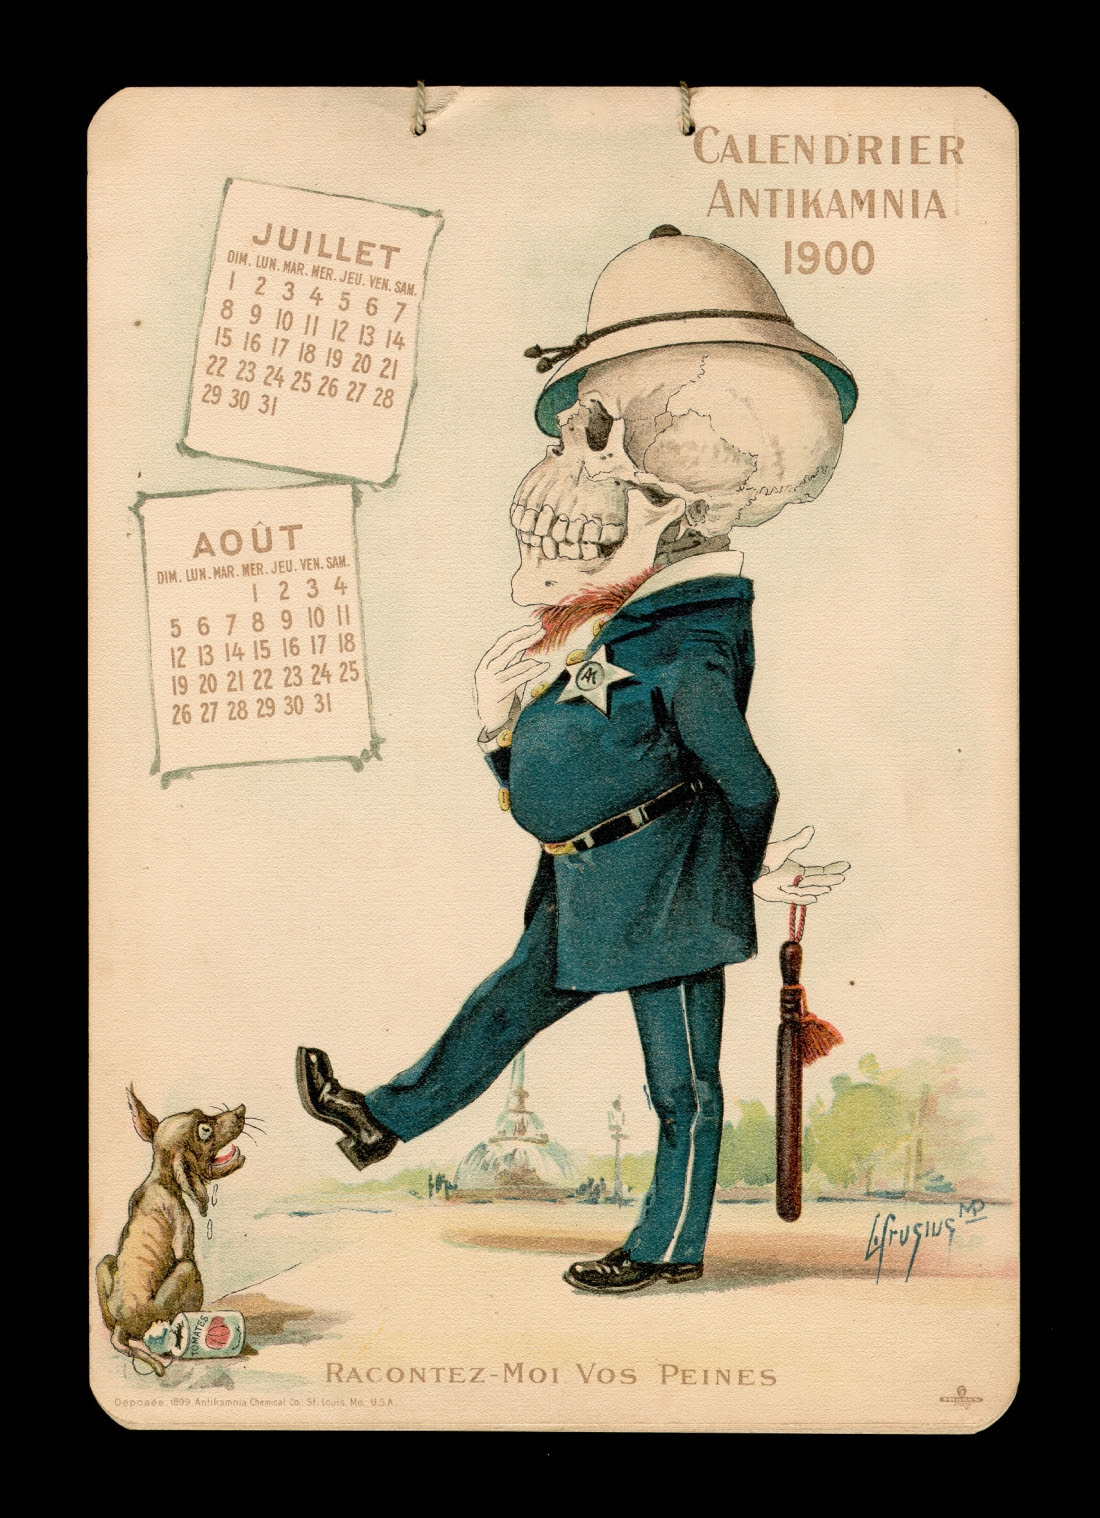 Antikamnia calendar 1900 - francais